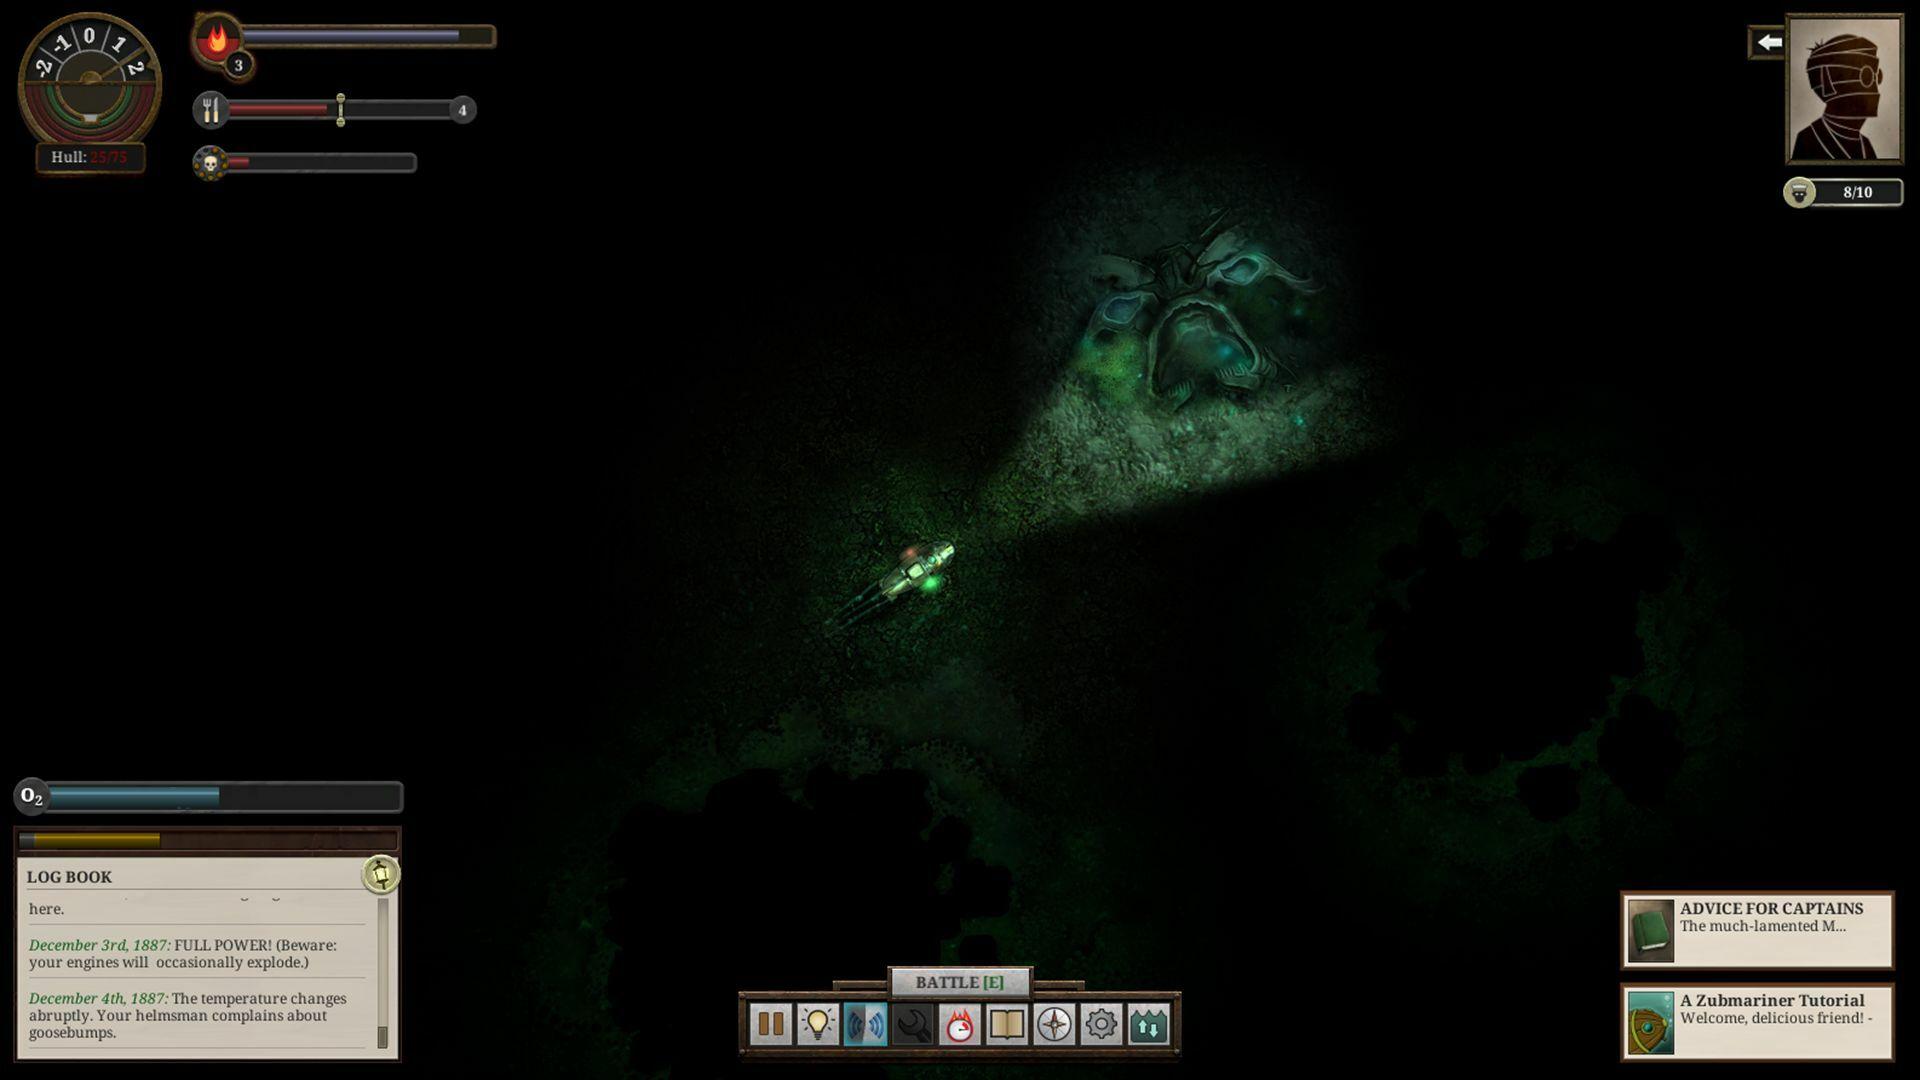 sunless-sea-zubmariner-bundle-pc-screenshot-1